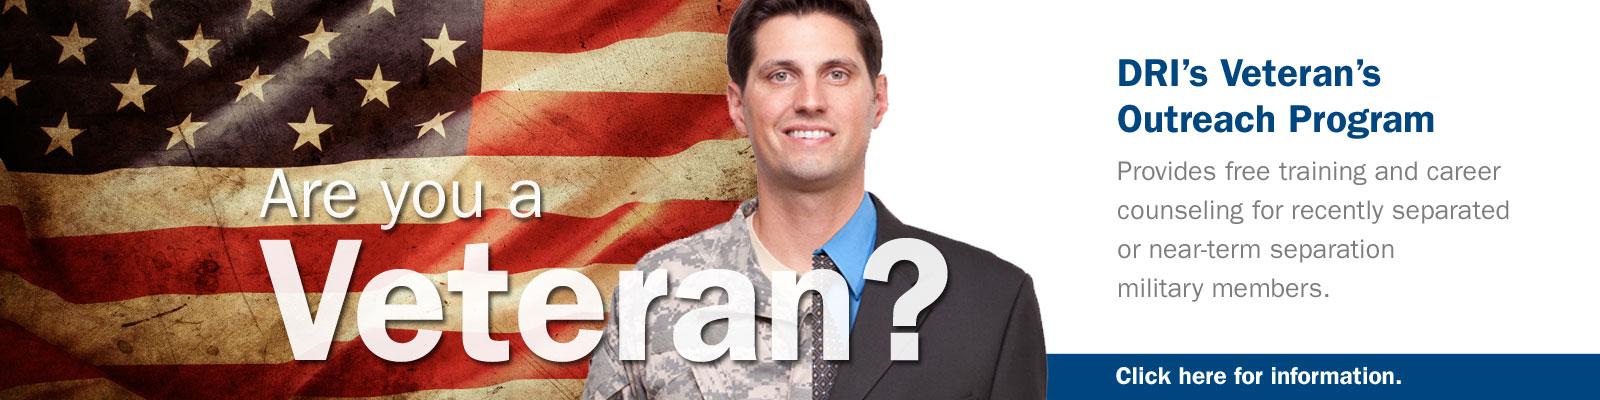 Veteran's Outreach Program